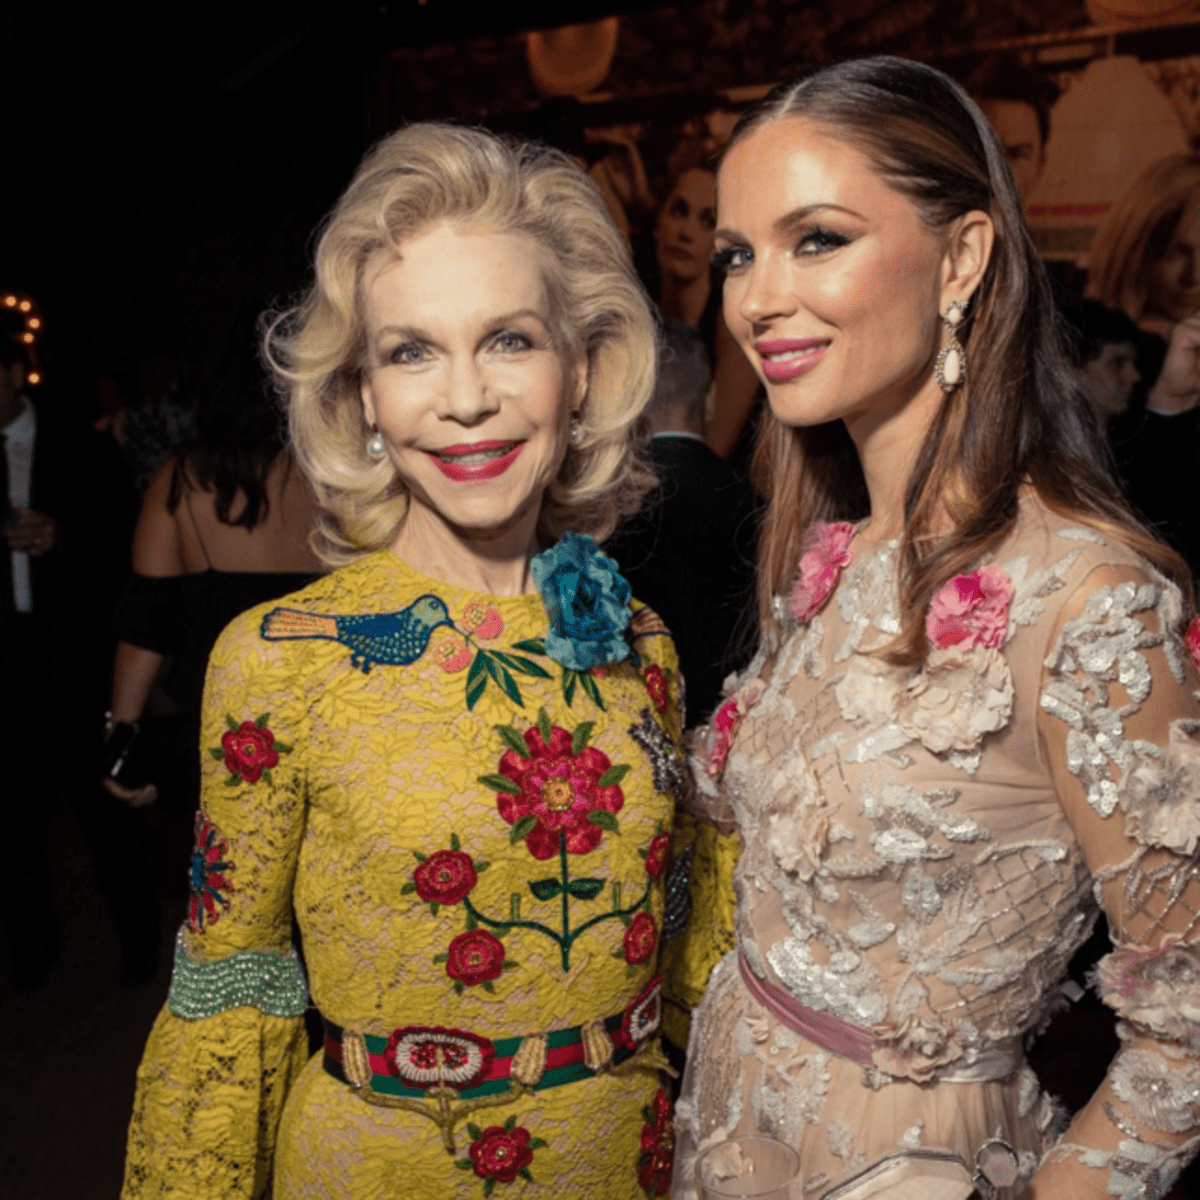 Lynn Wyatt in Gucci and Georgina Chapman at Vanity Fair party February 2016